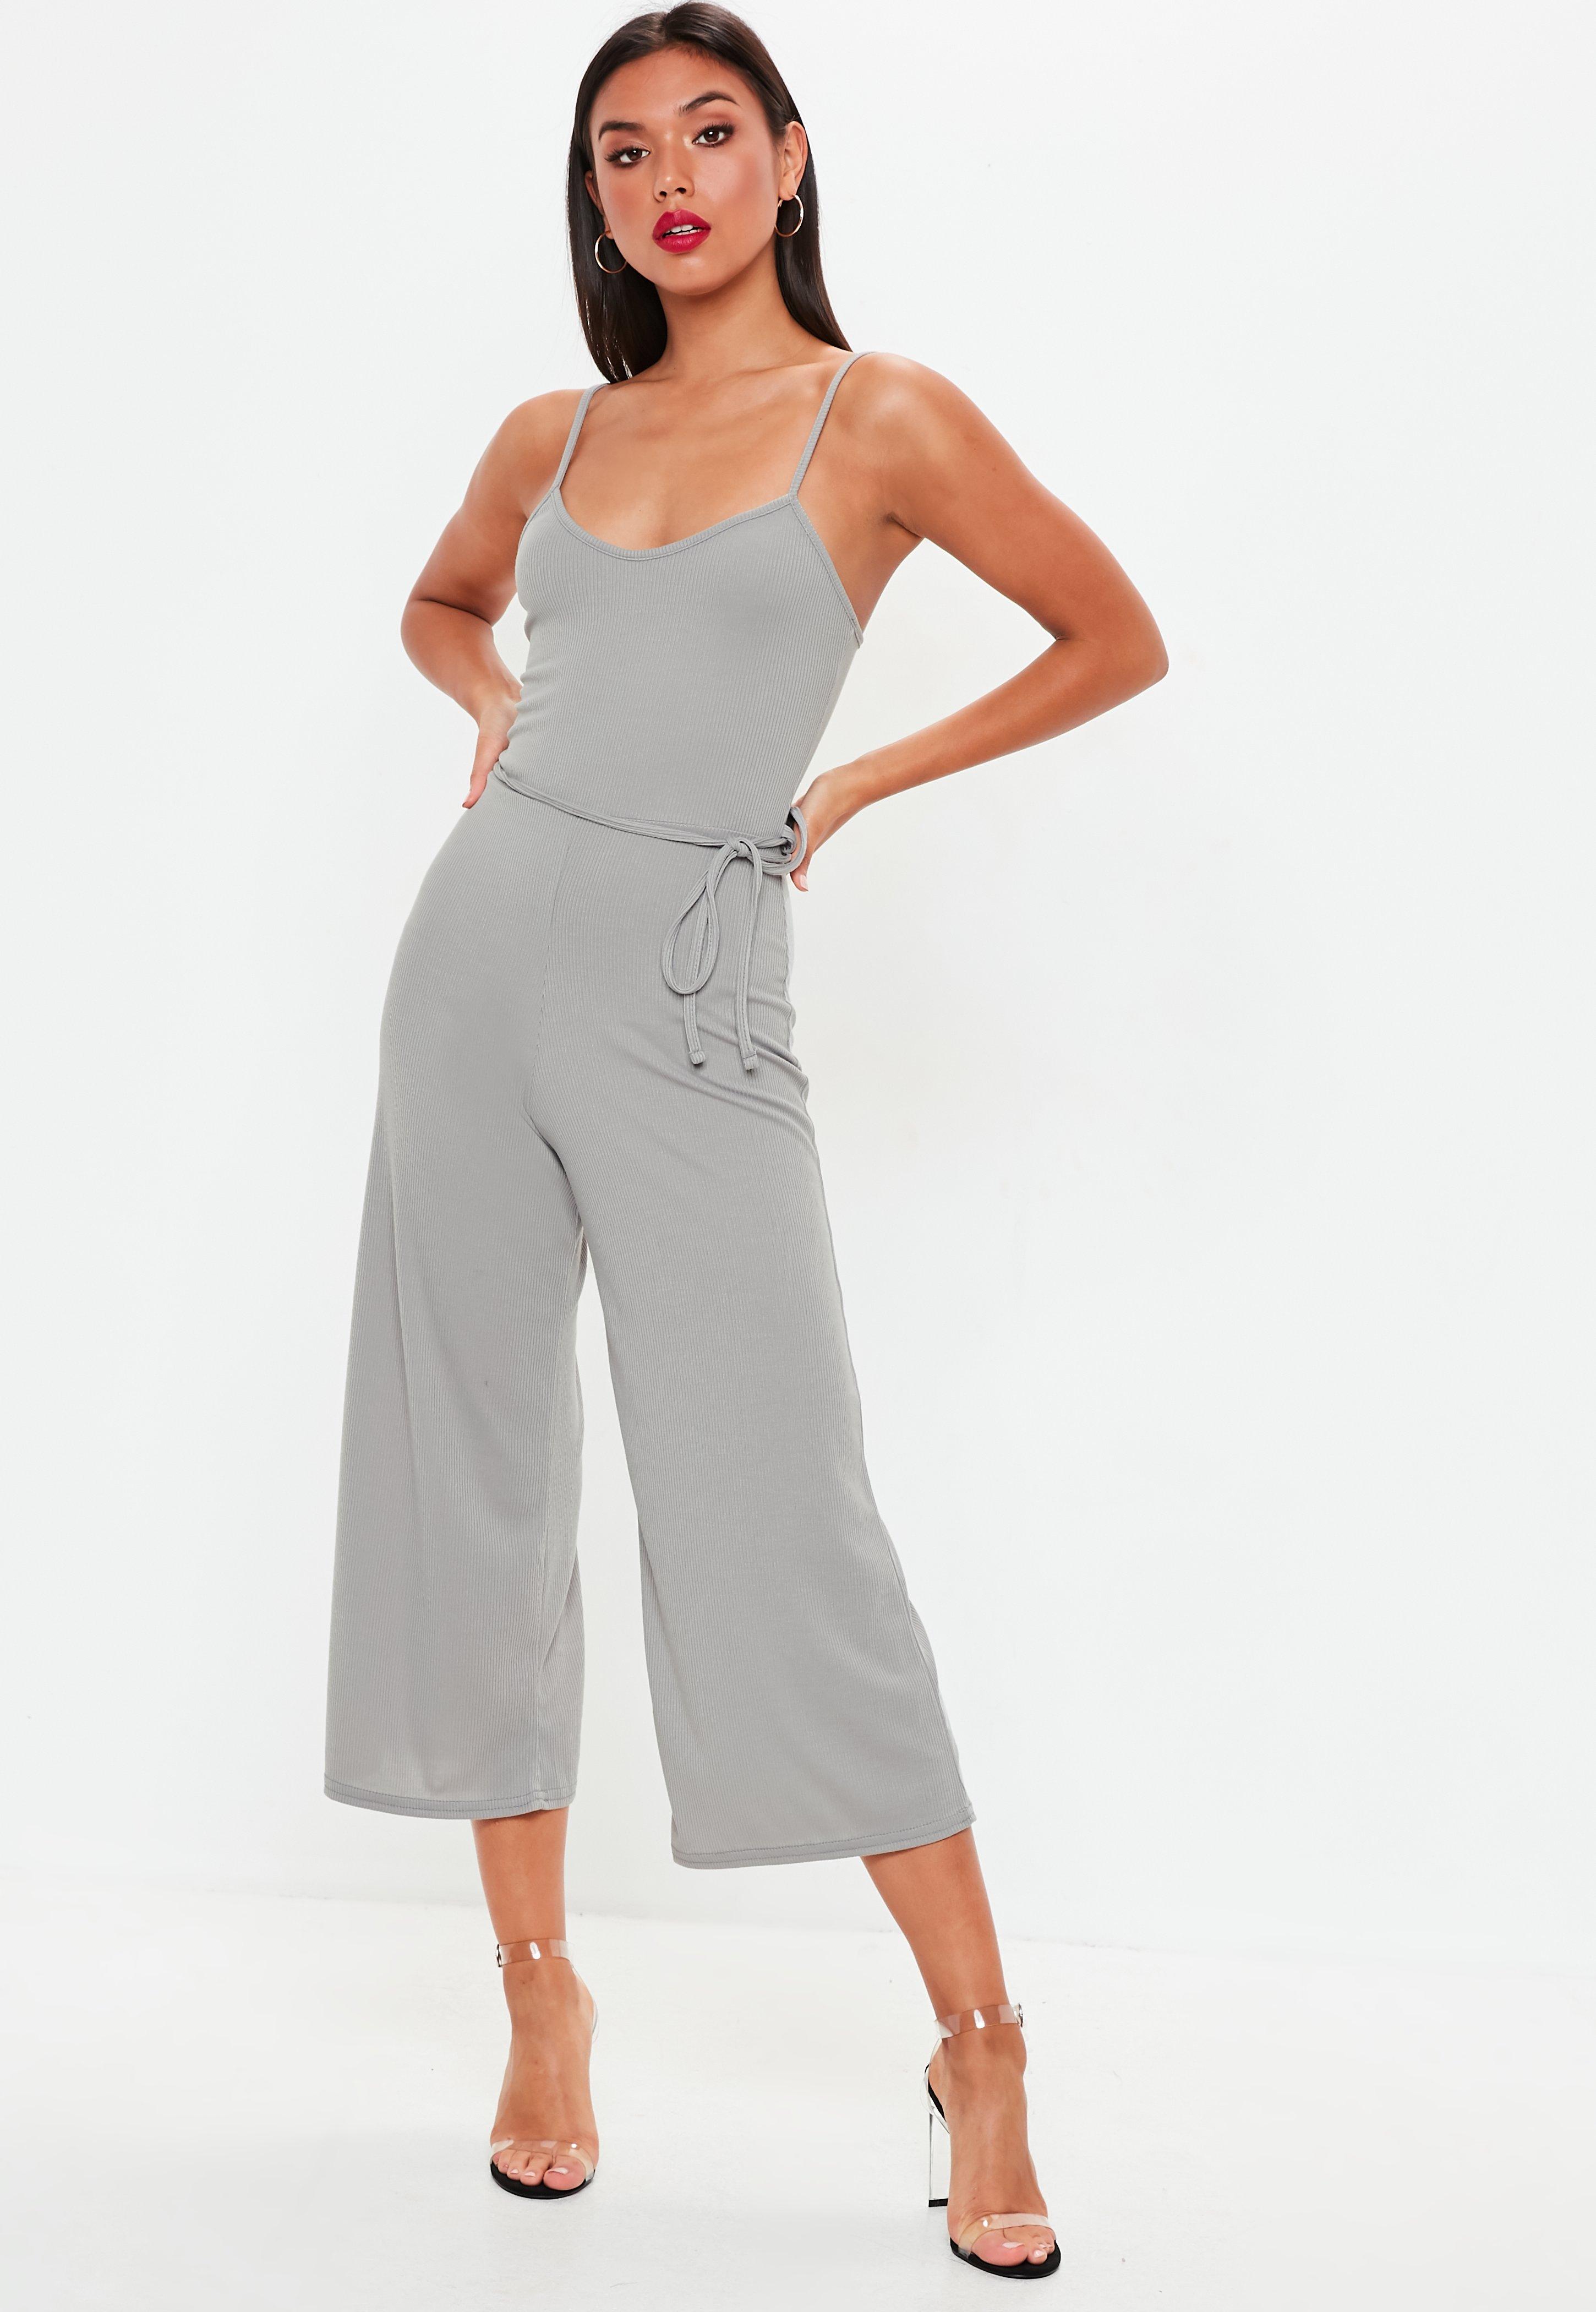 4f8646679ab0 Culotte Jumpsuits